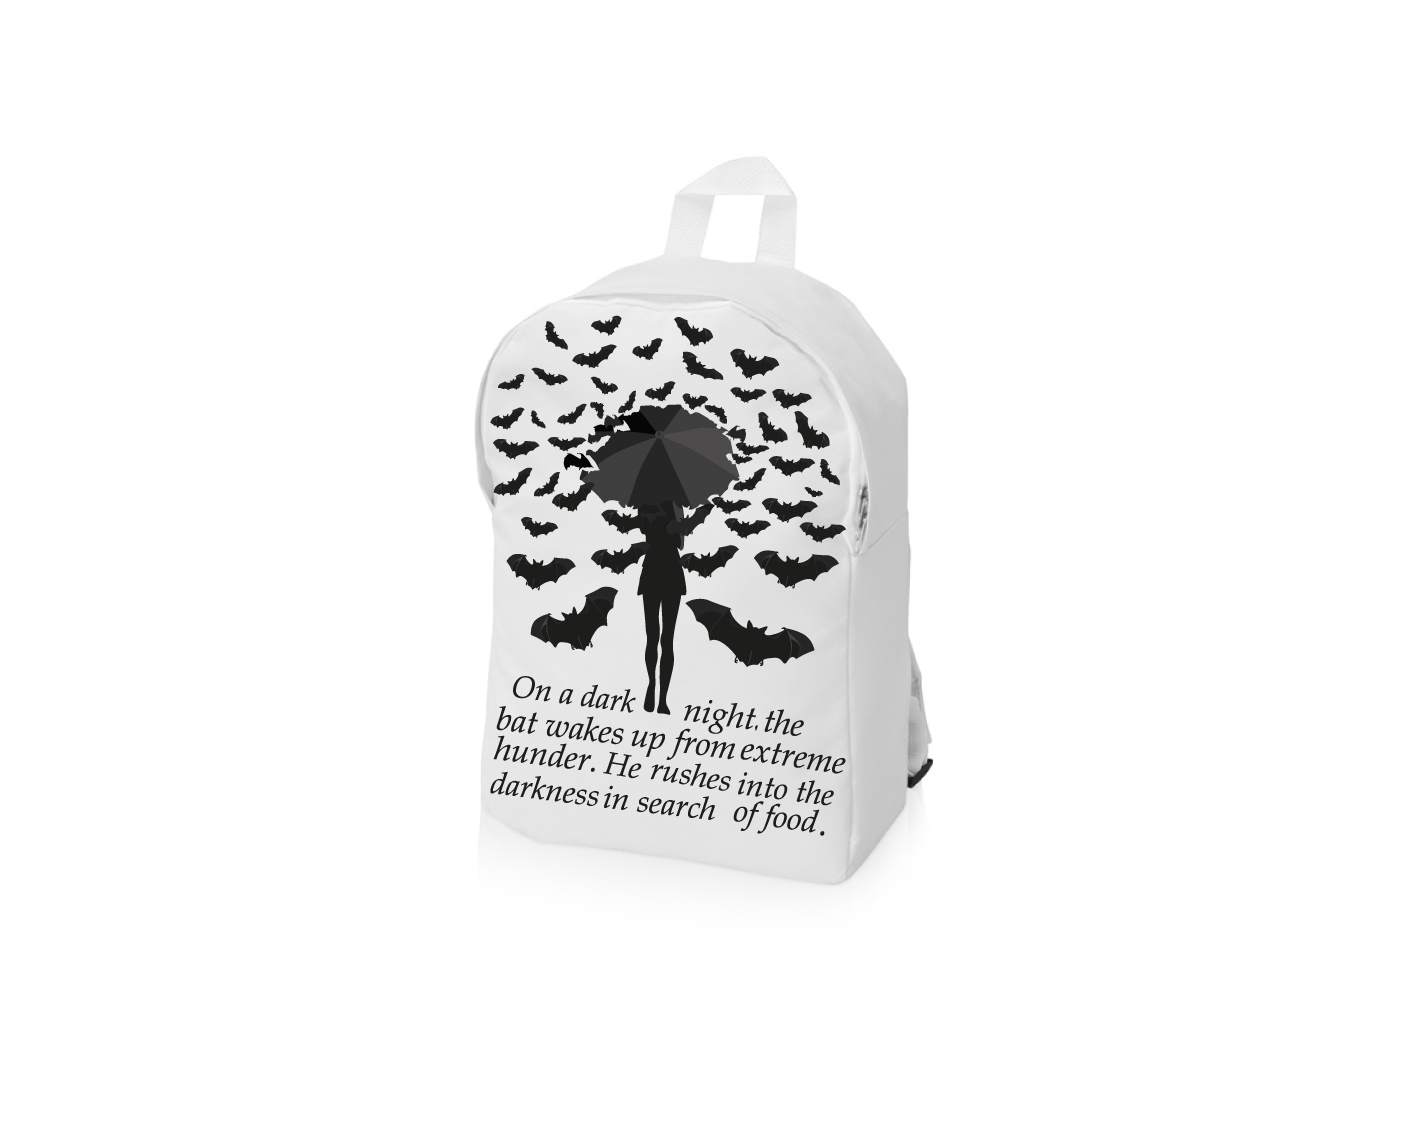 Конкурс на создание оригинального принта для рюкзаков фото f_4665f8785cae6157.jpg